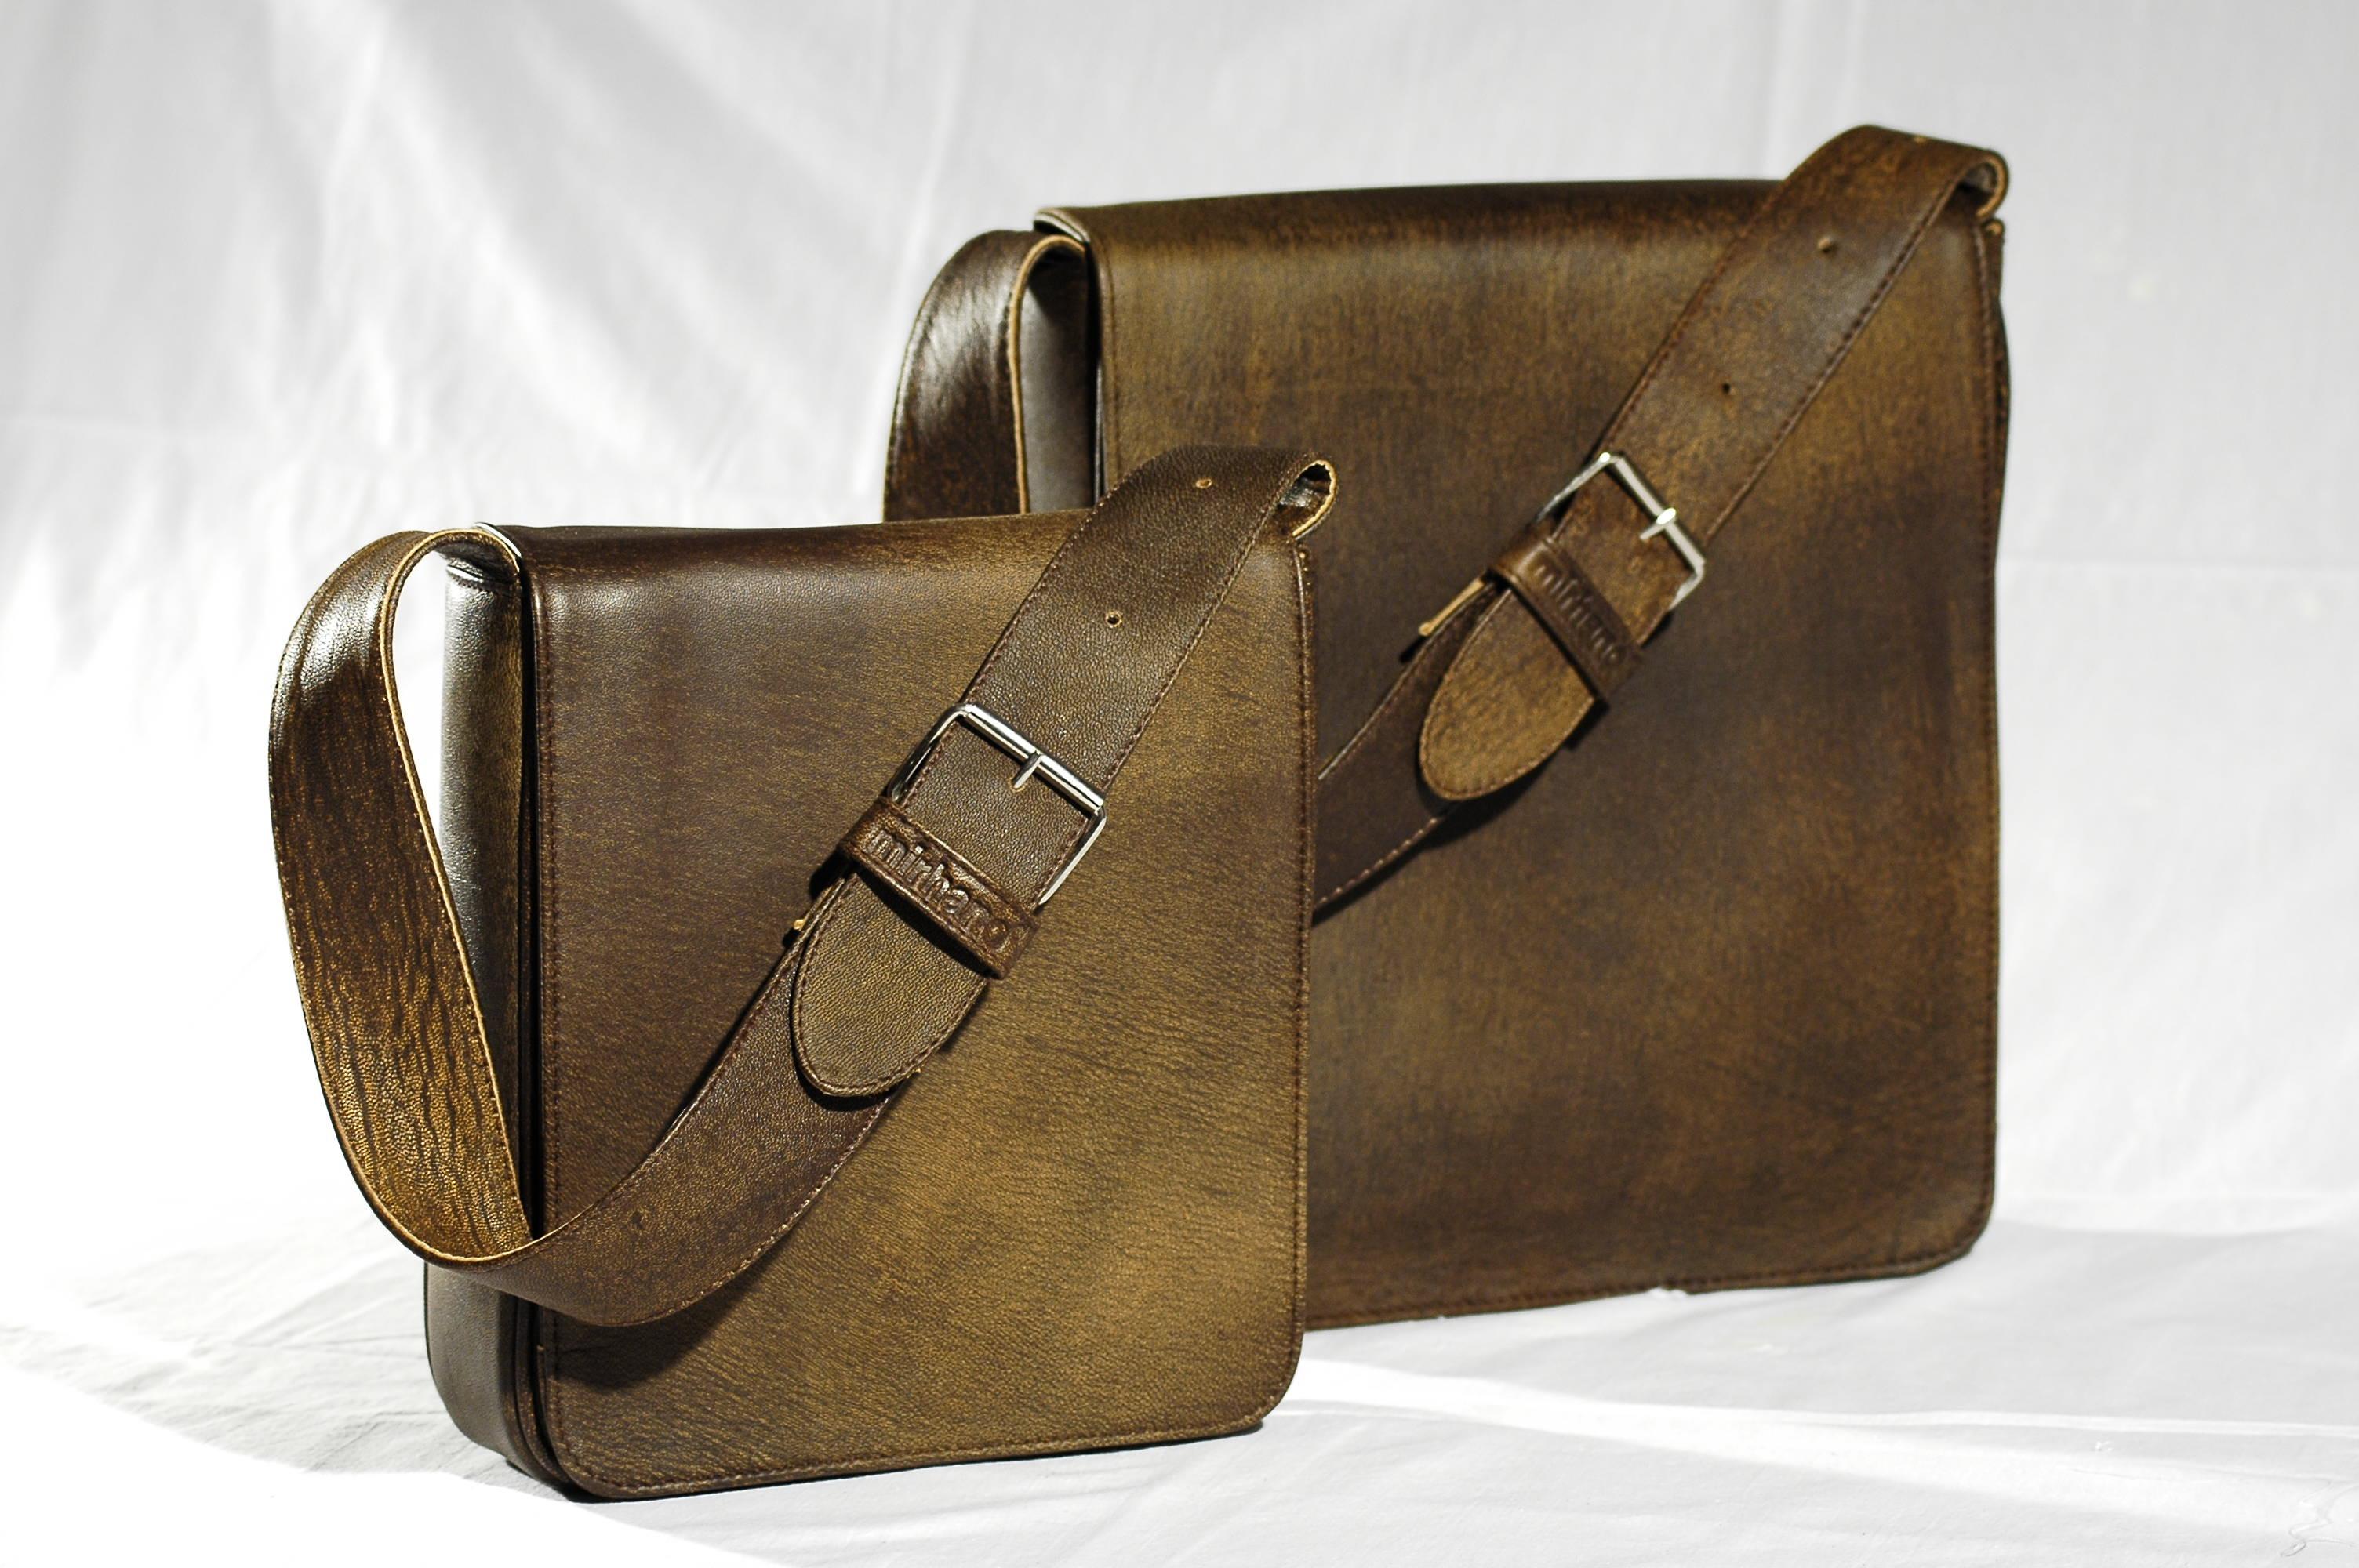 sac de luxe en ligne